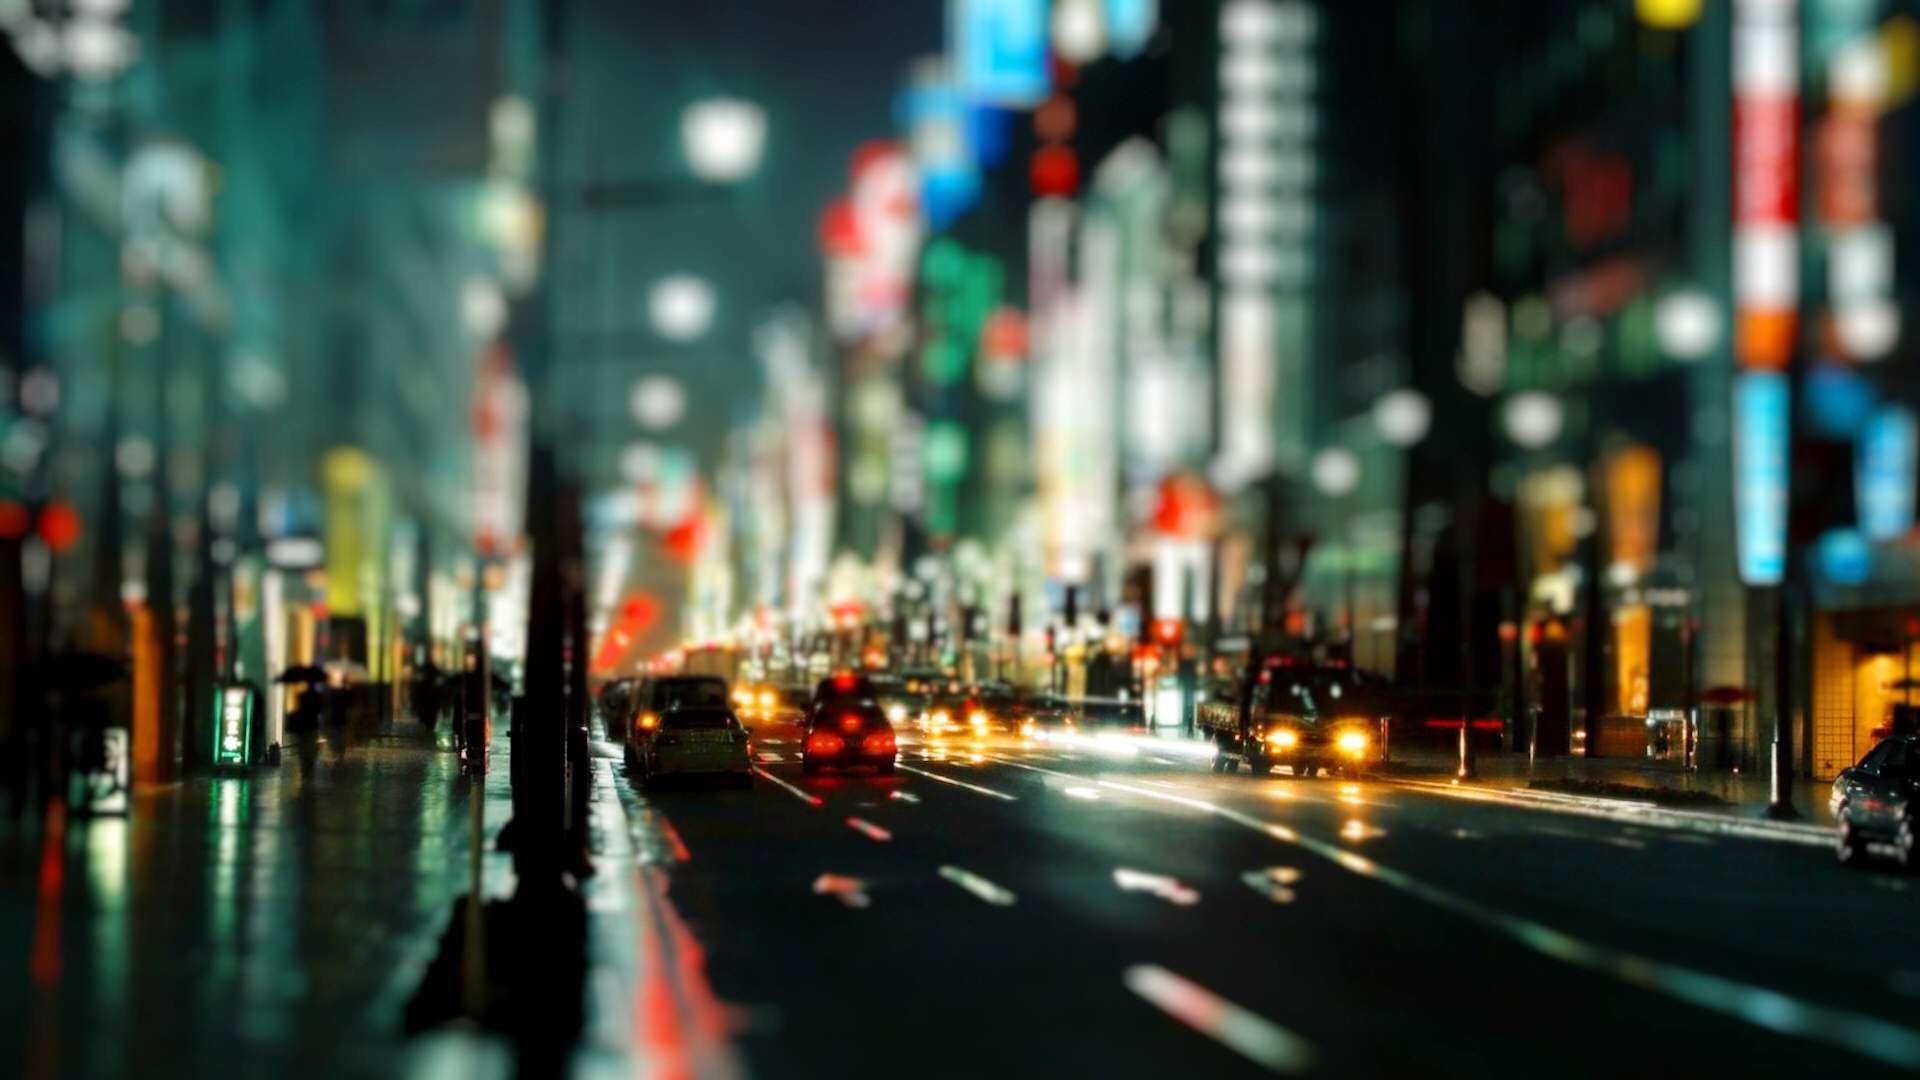 Tokyo Wallpaper HD 70 images